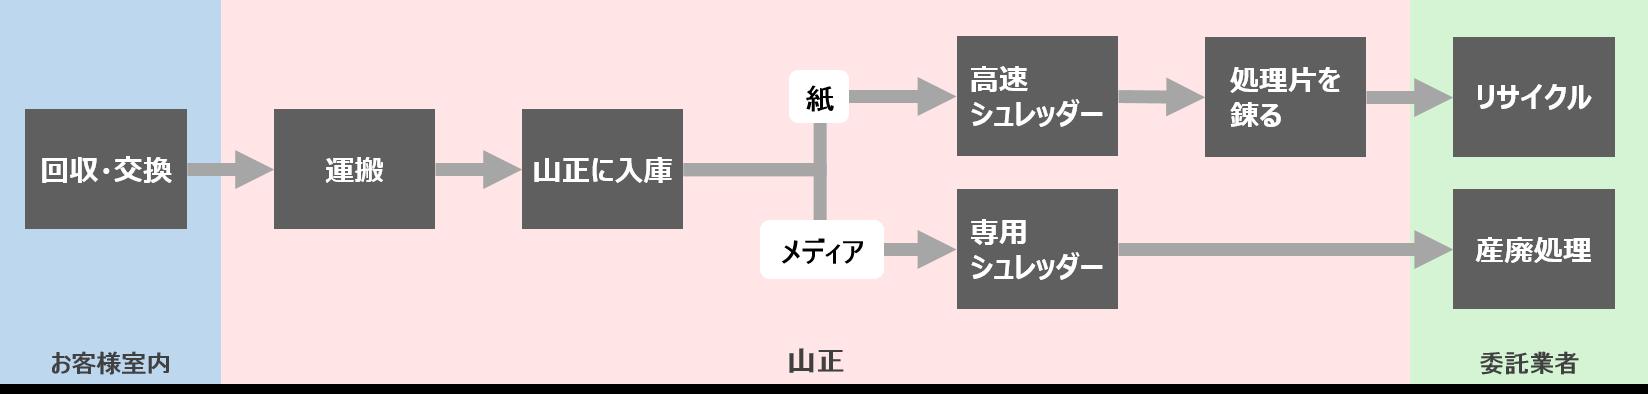 01kim_syos_01a